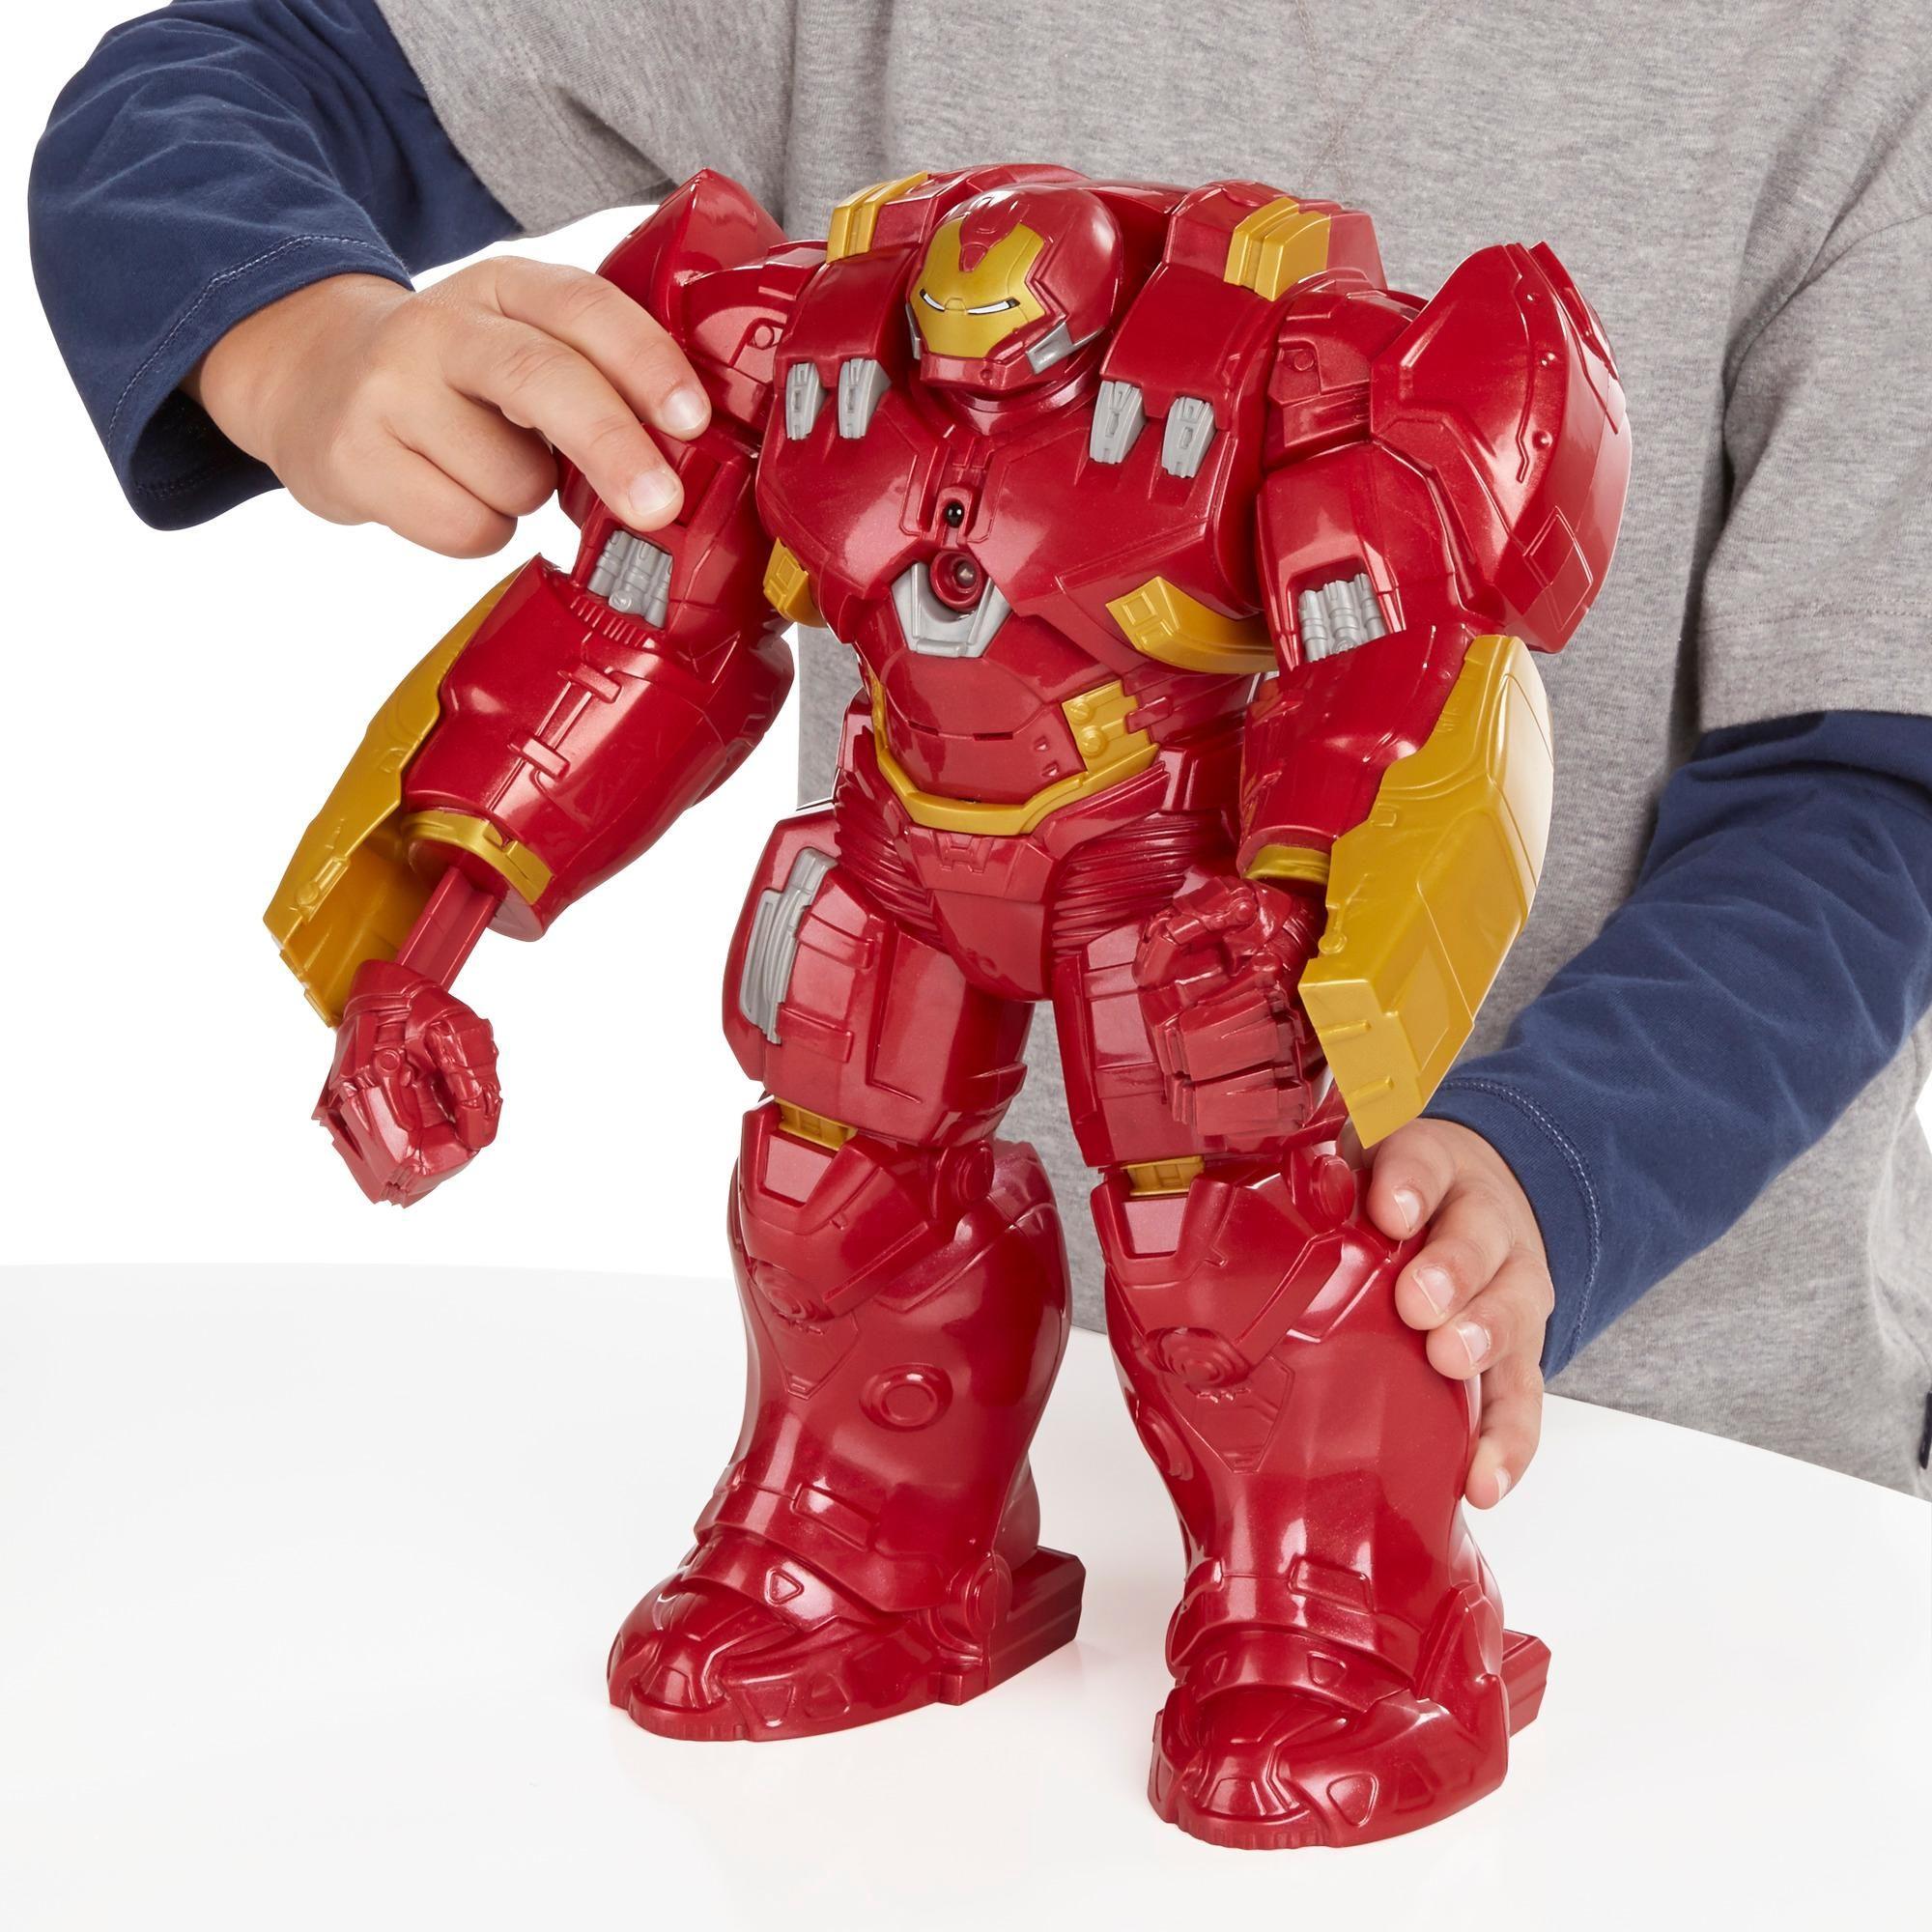 Avengers B04411010 Figurine Cinema Interactive Armure Hulk Buster Amazon Fr Jeux Et Jouets Avengers Figurine Hulk